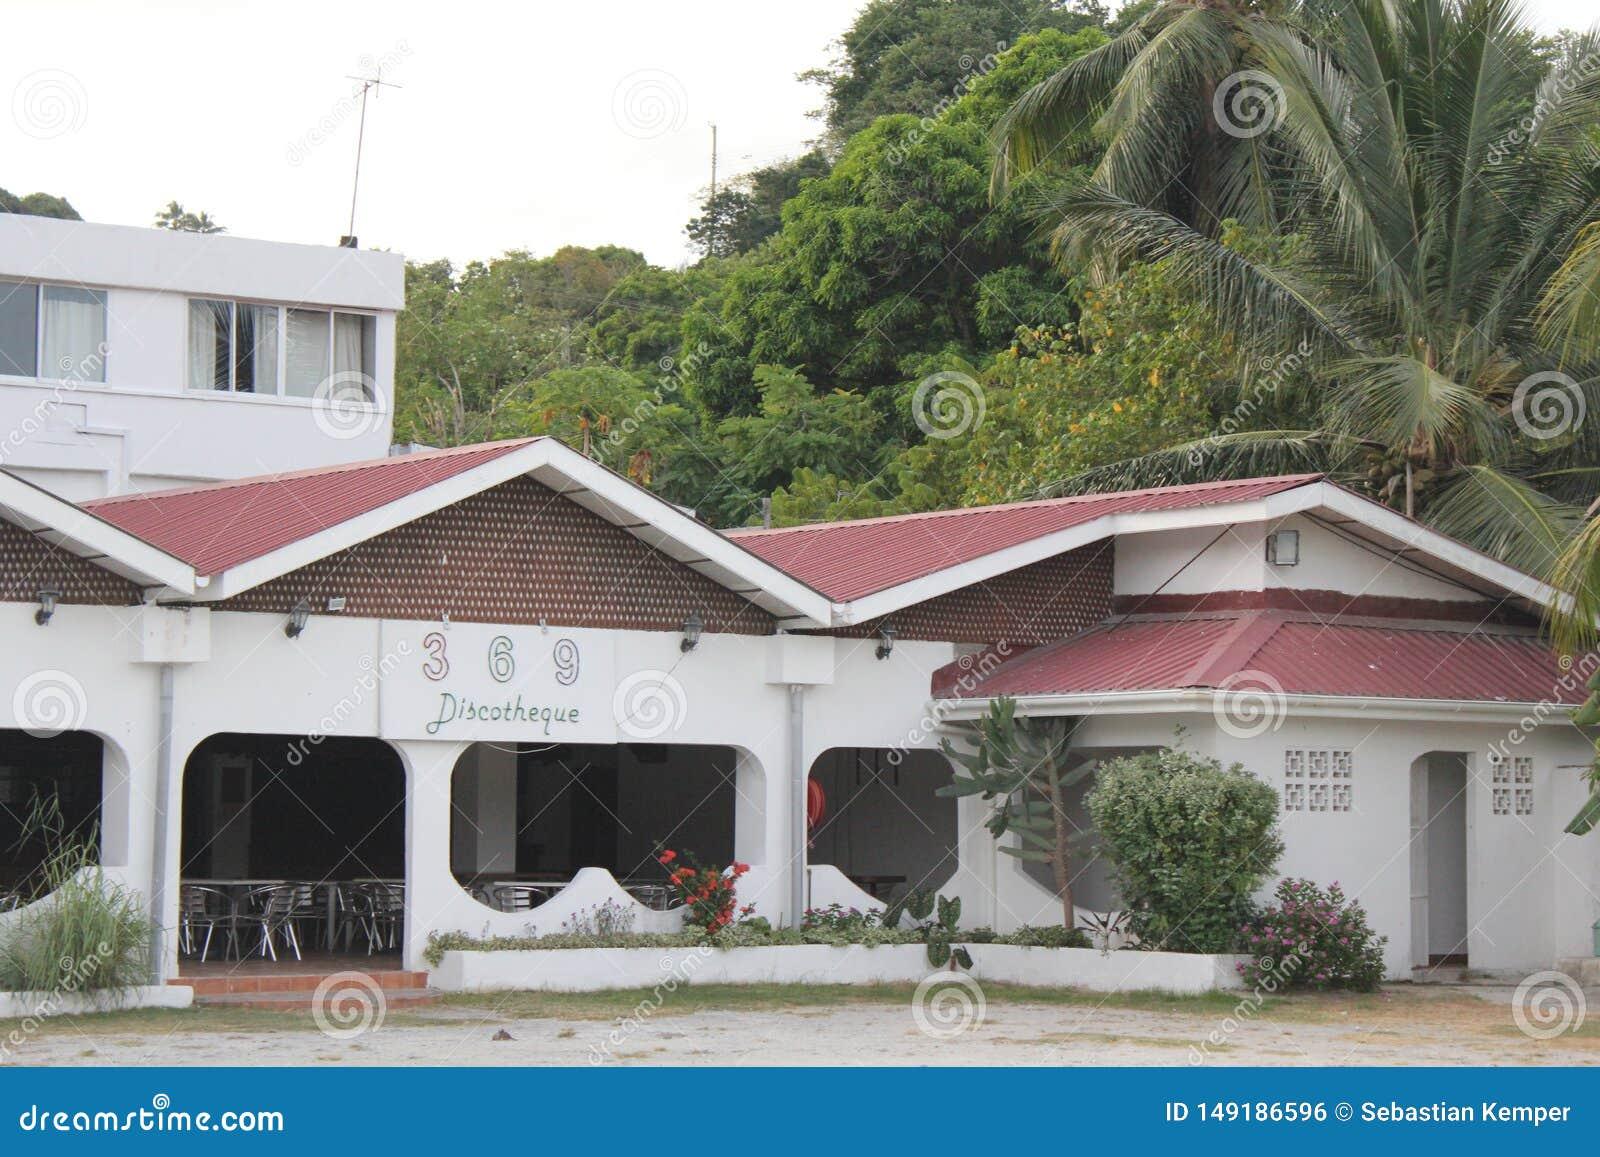 Seychelles Mahe Island Beach Editorial Photo Image Of